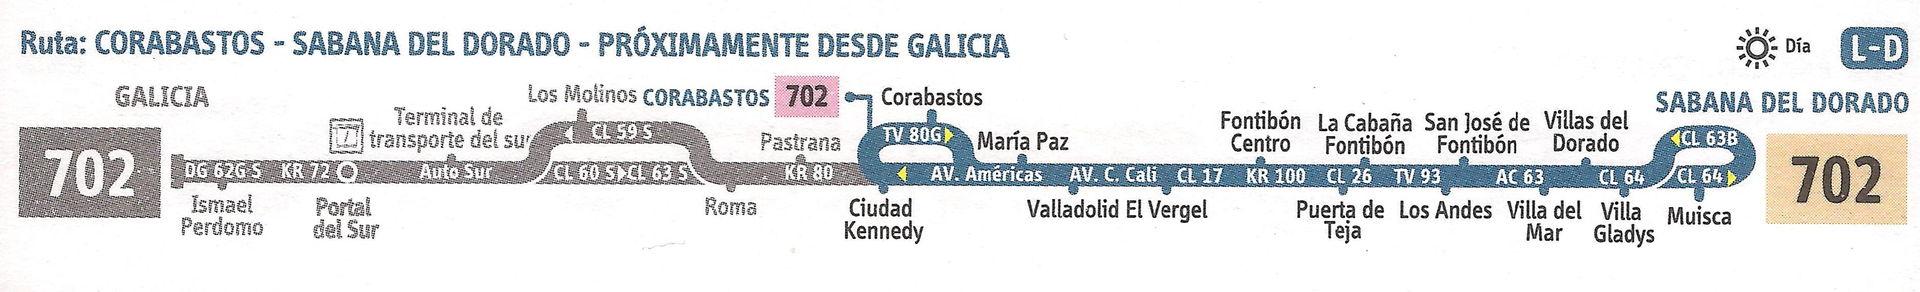 Ruta SITP: 702 Corabastos ↔ Sabana del Dorado [Urbana] 2